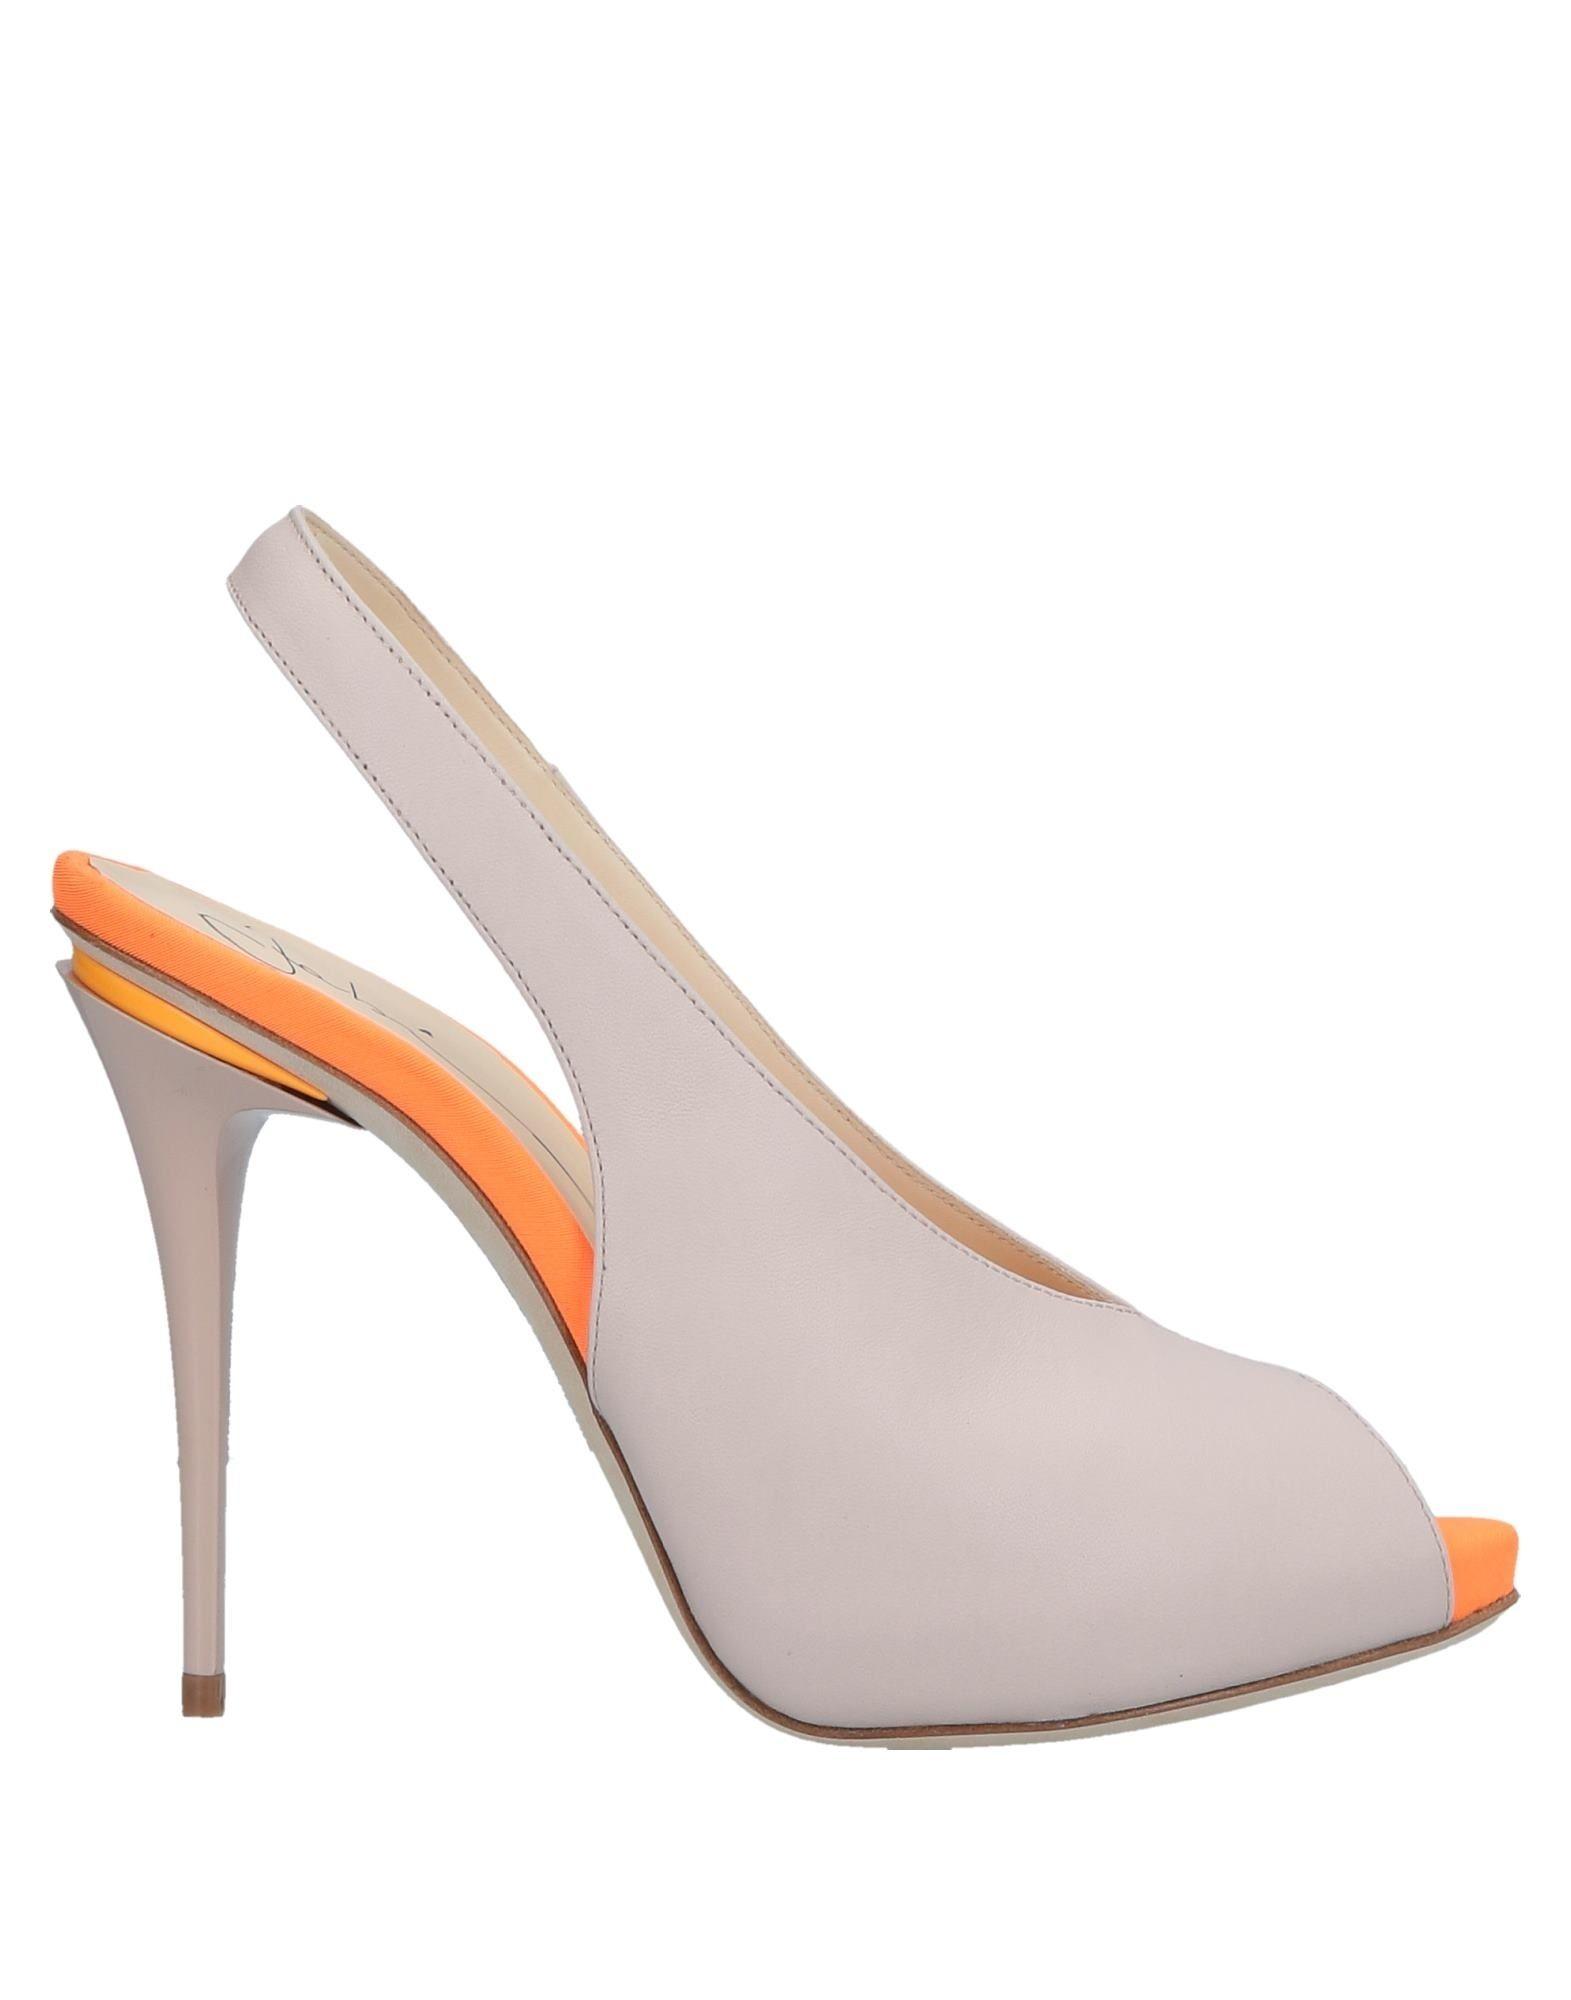 Sandales Fabi Femme - Sandales Fabi   - 11615719SN